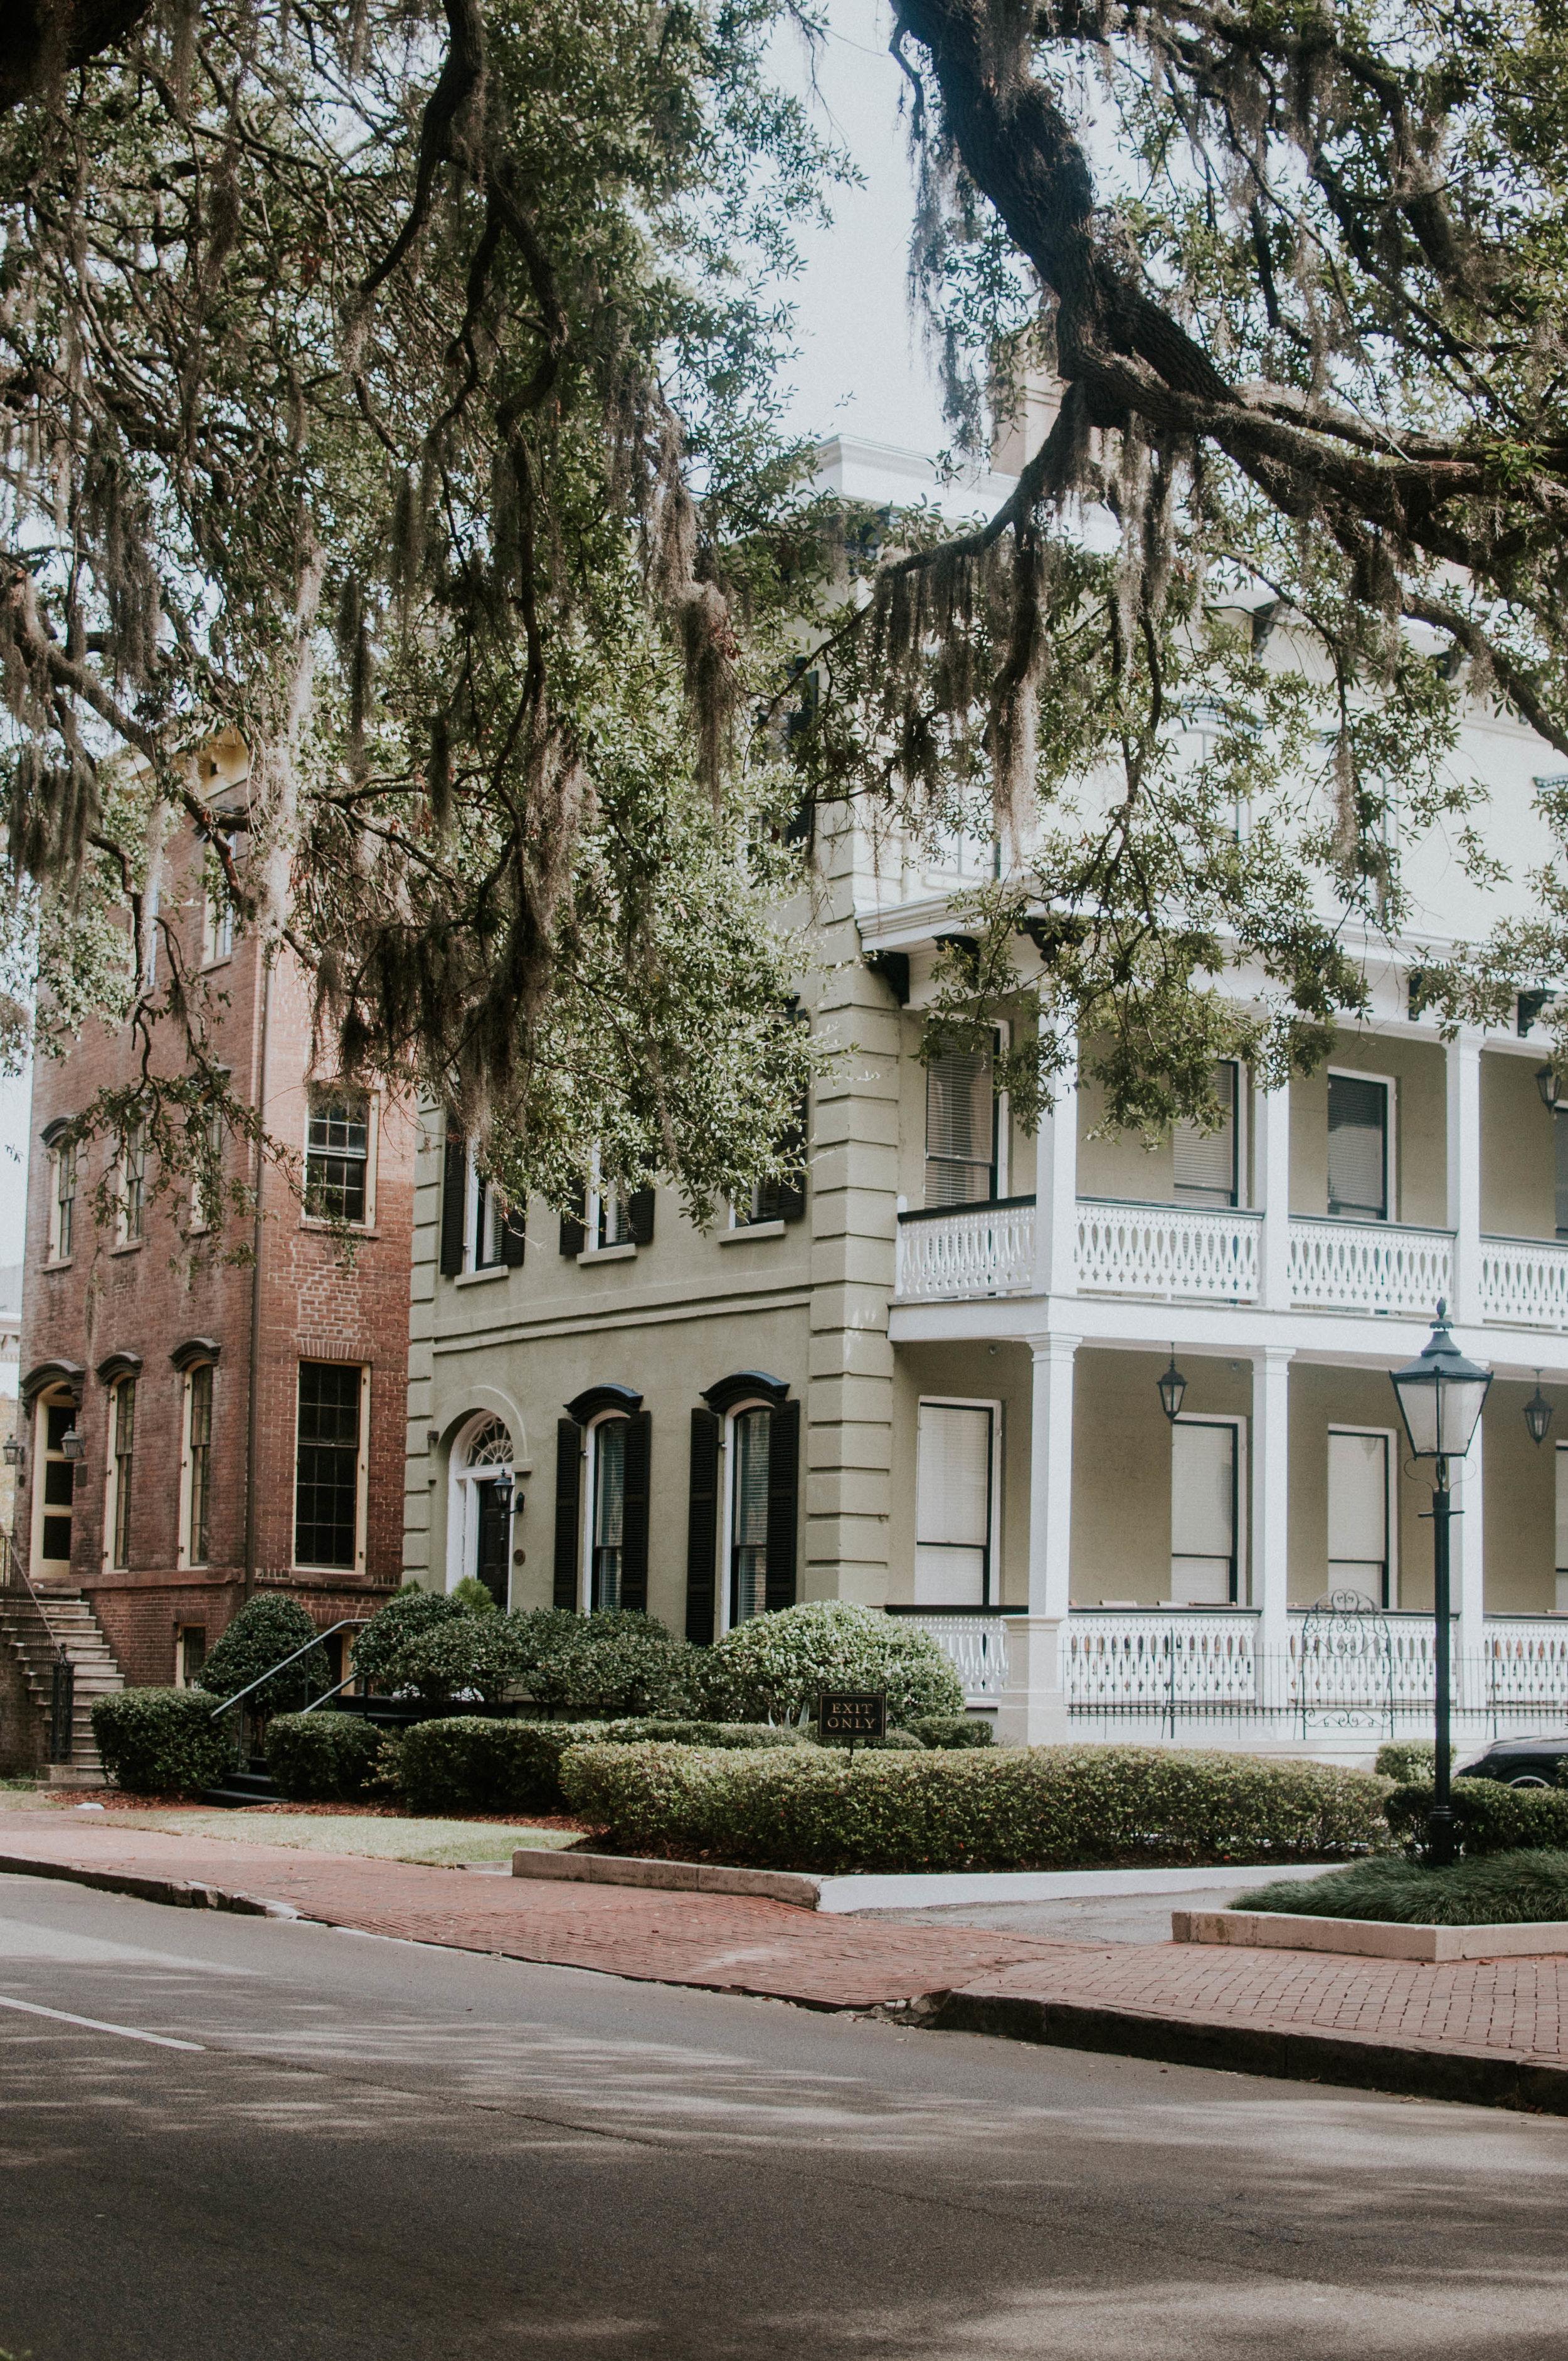 Charleston & Savannah - Monday, April 13 - Saturday, April 18, 2020